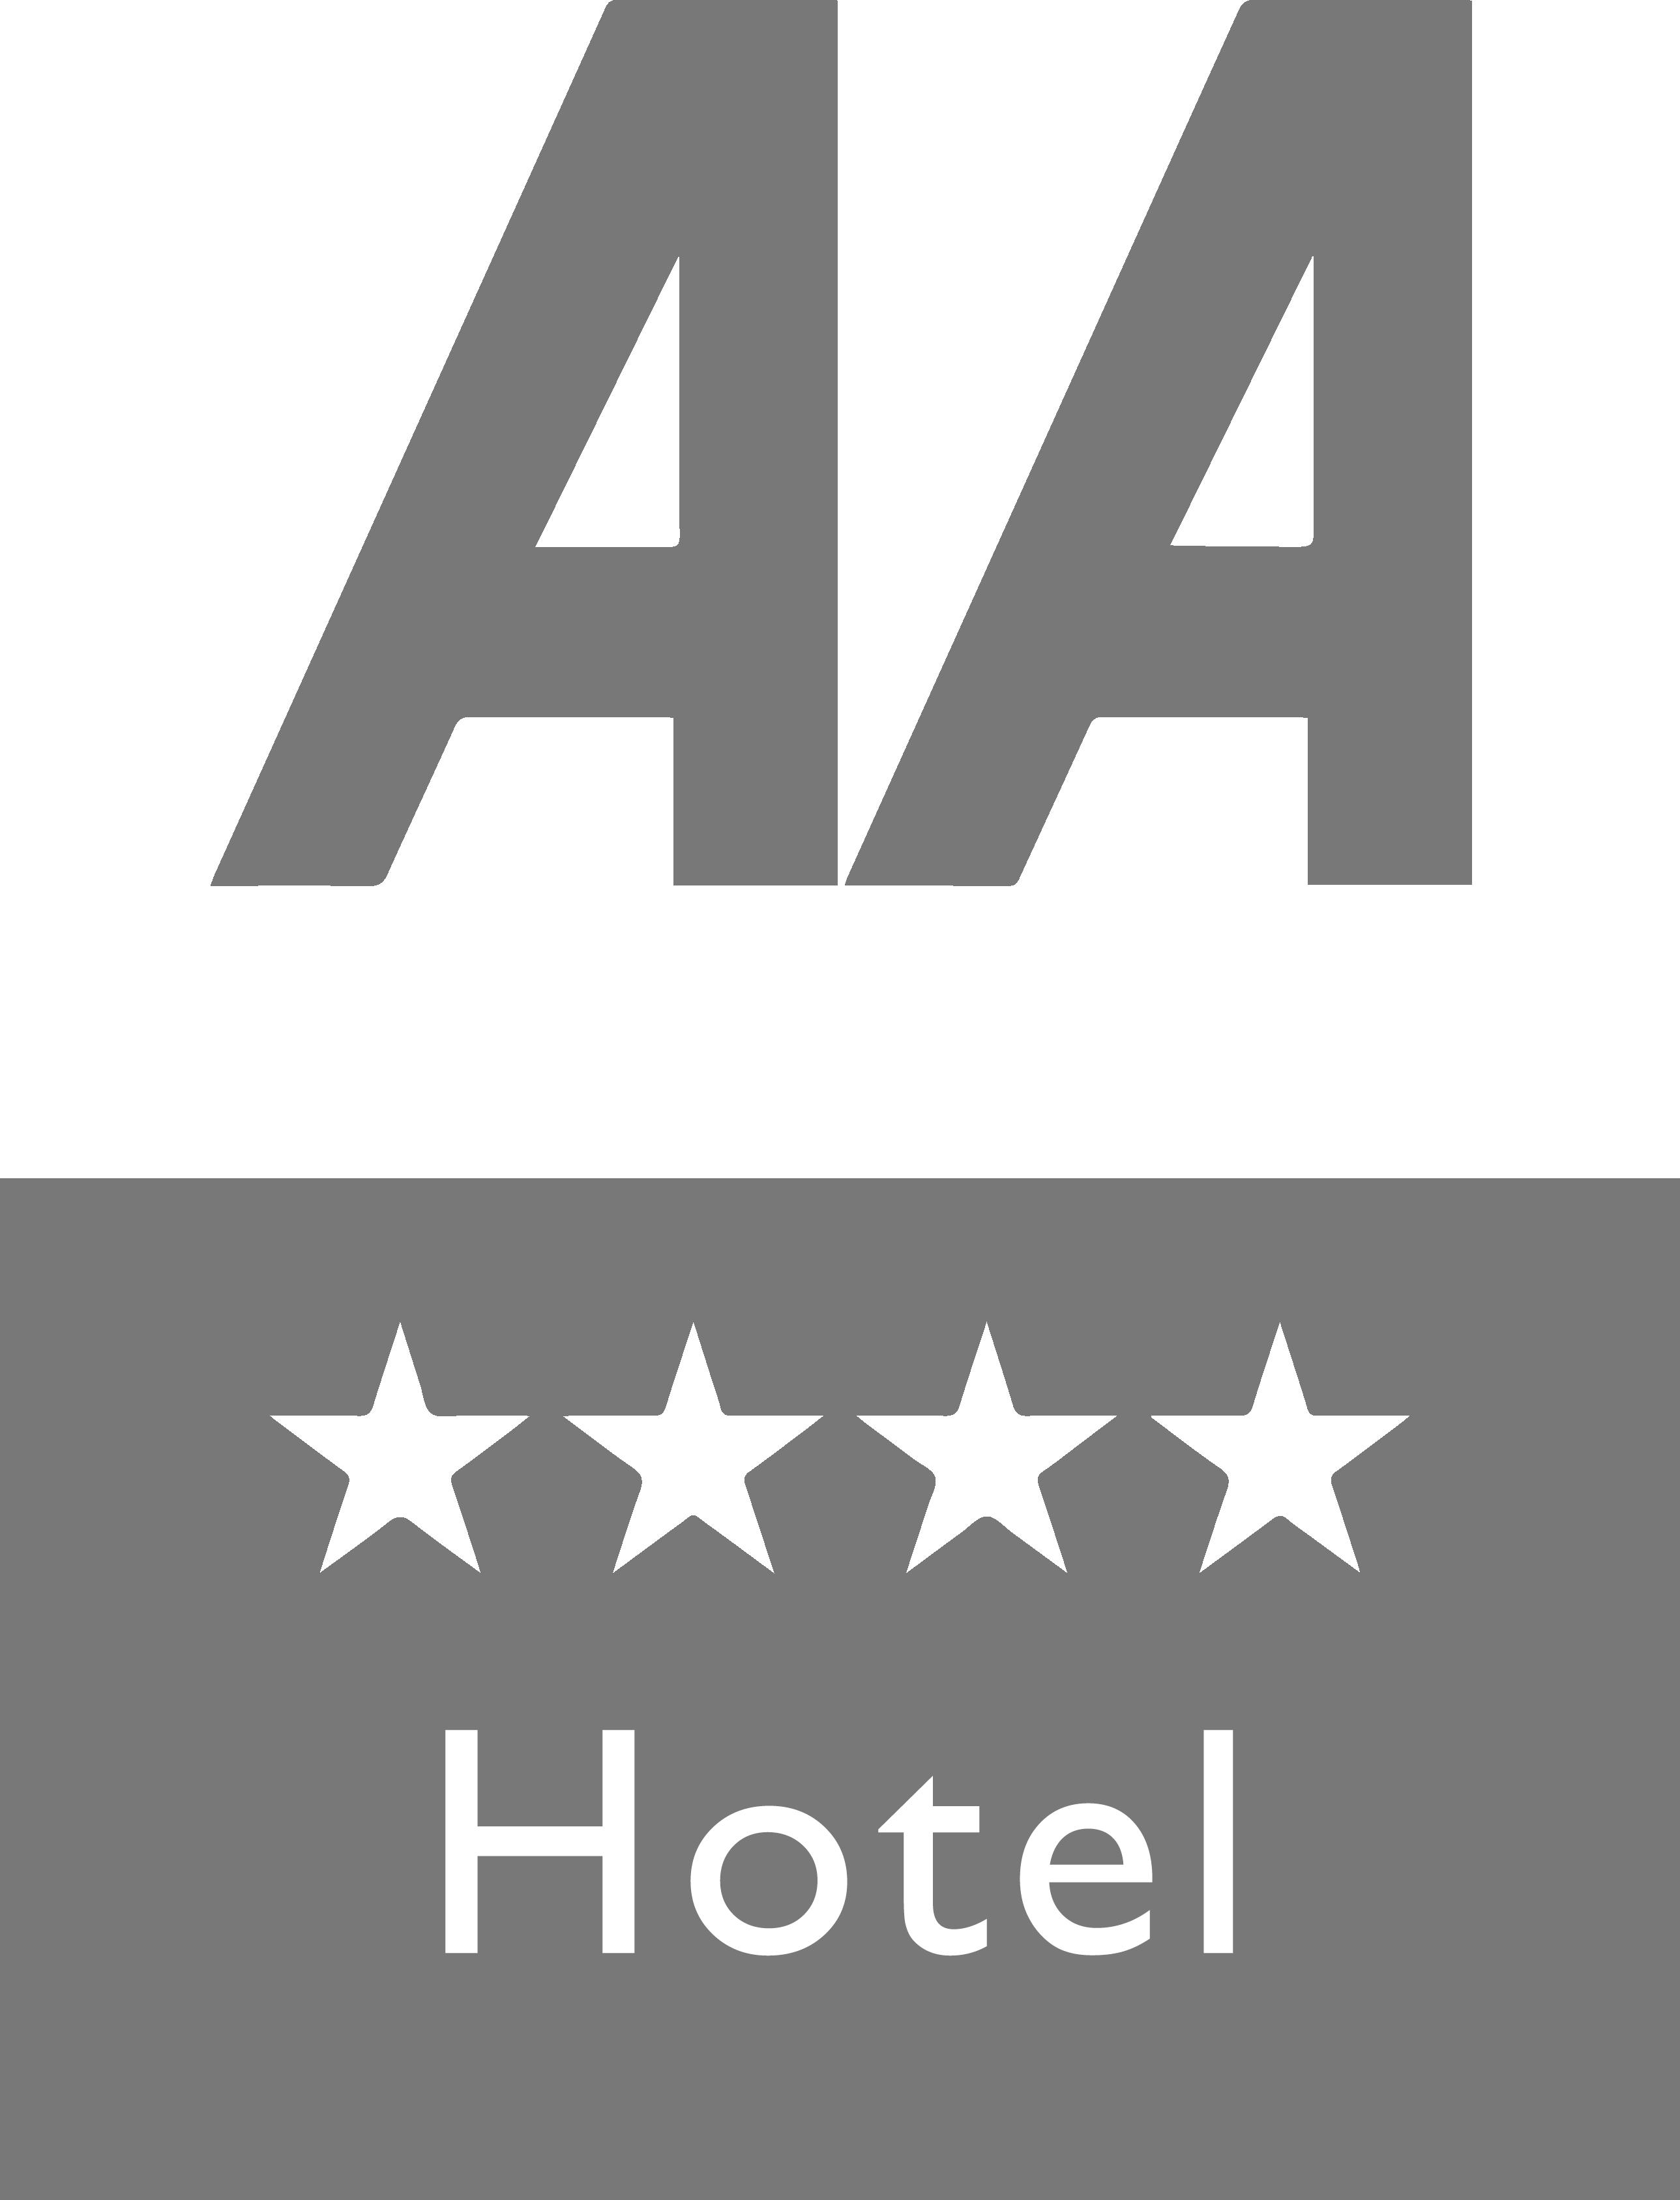 AA 4 Star Hotel